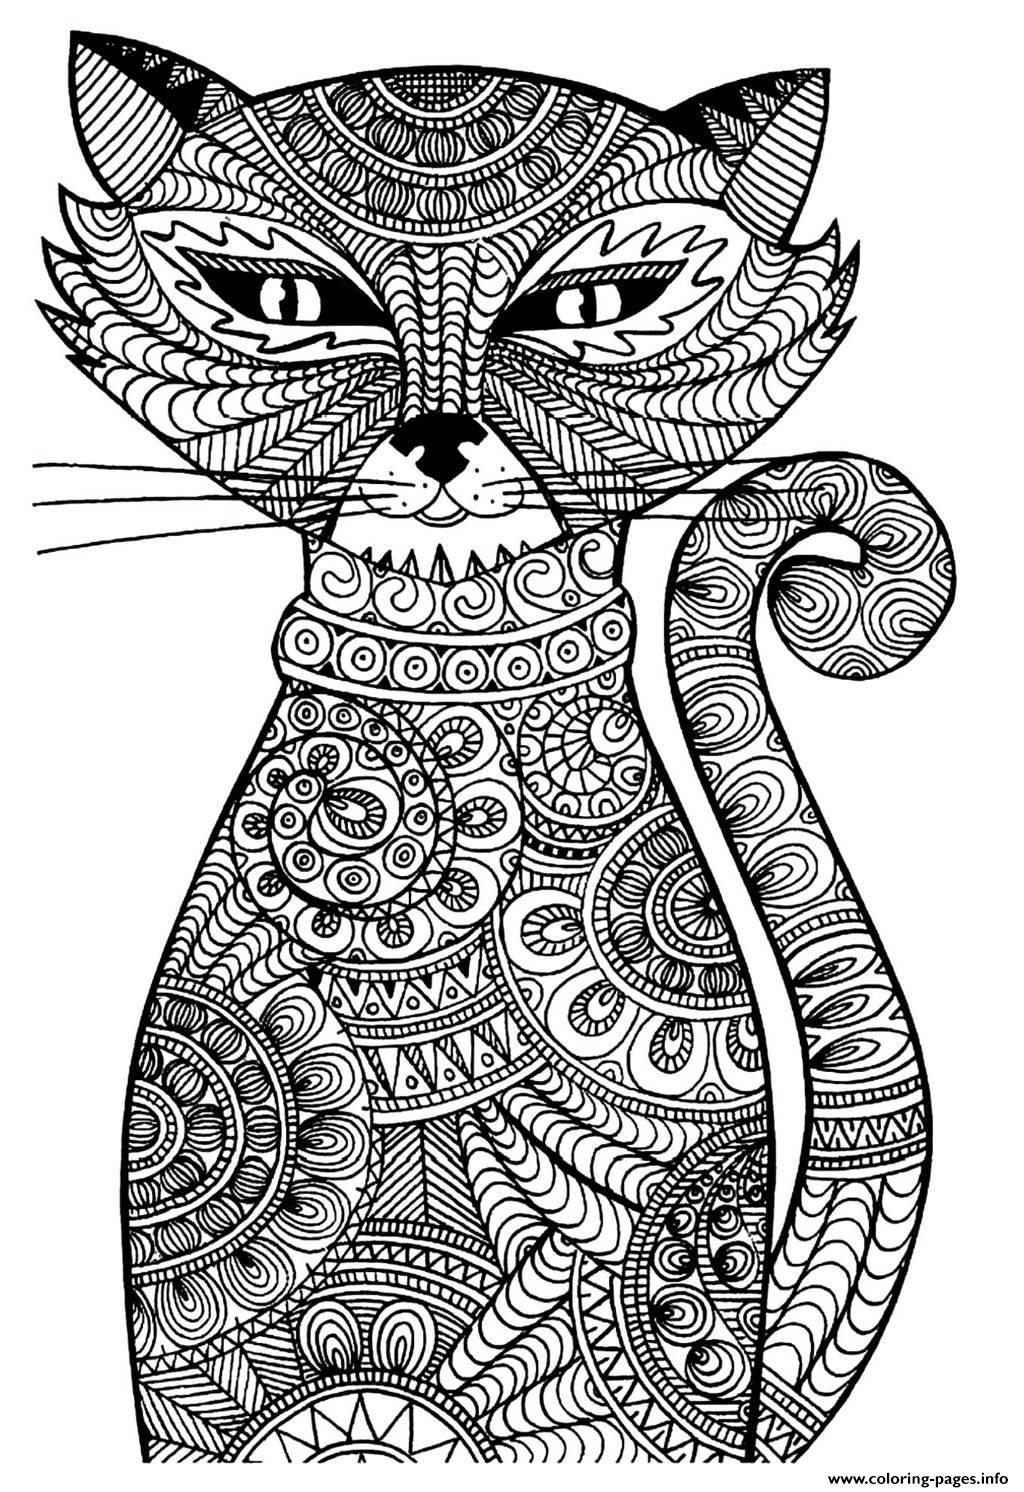 mandala de gato | GATOS | Pinterest | Gato, Mandalas y Colorear